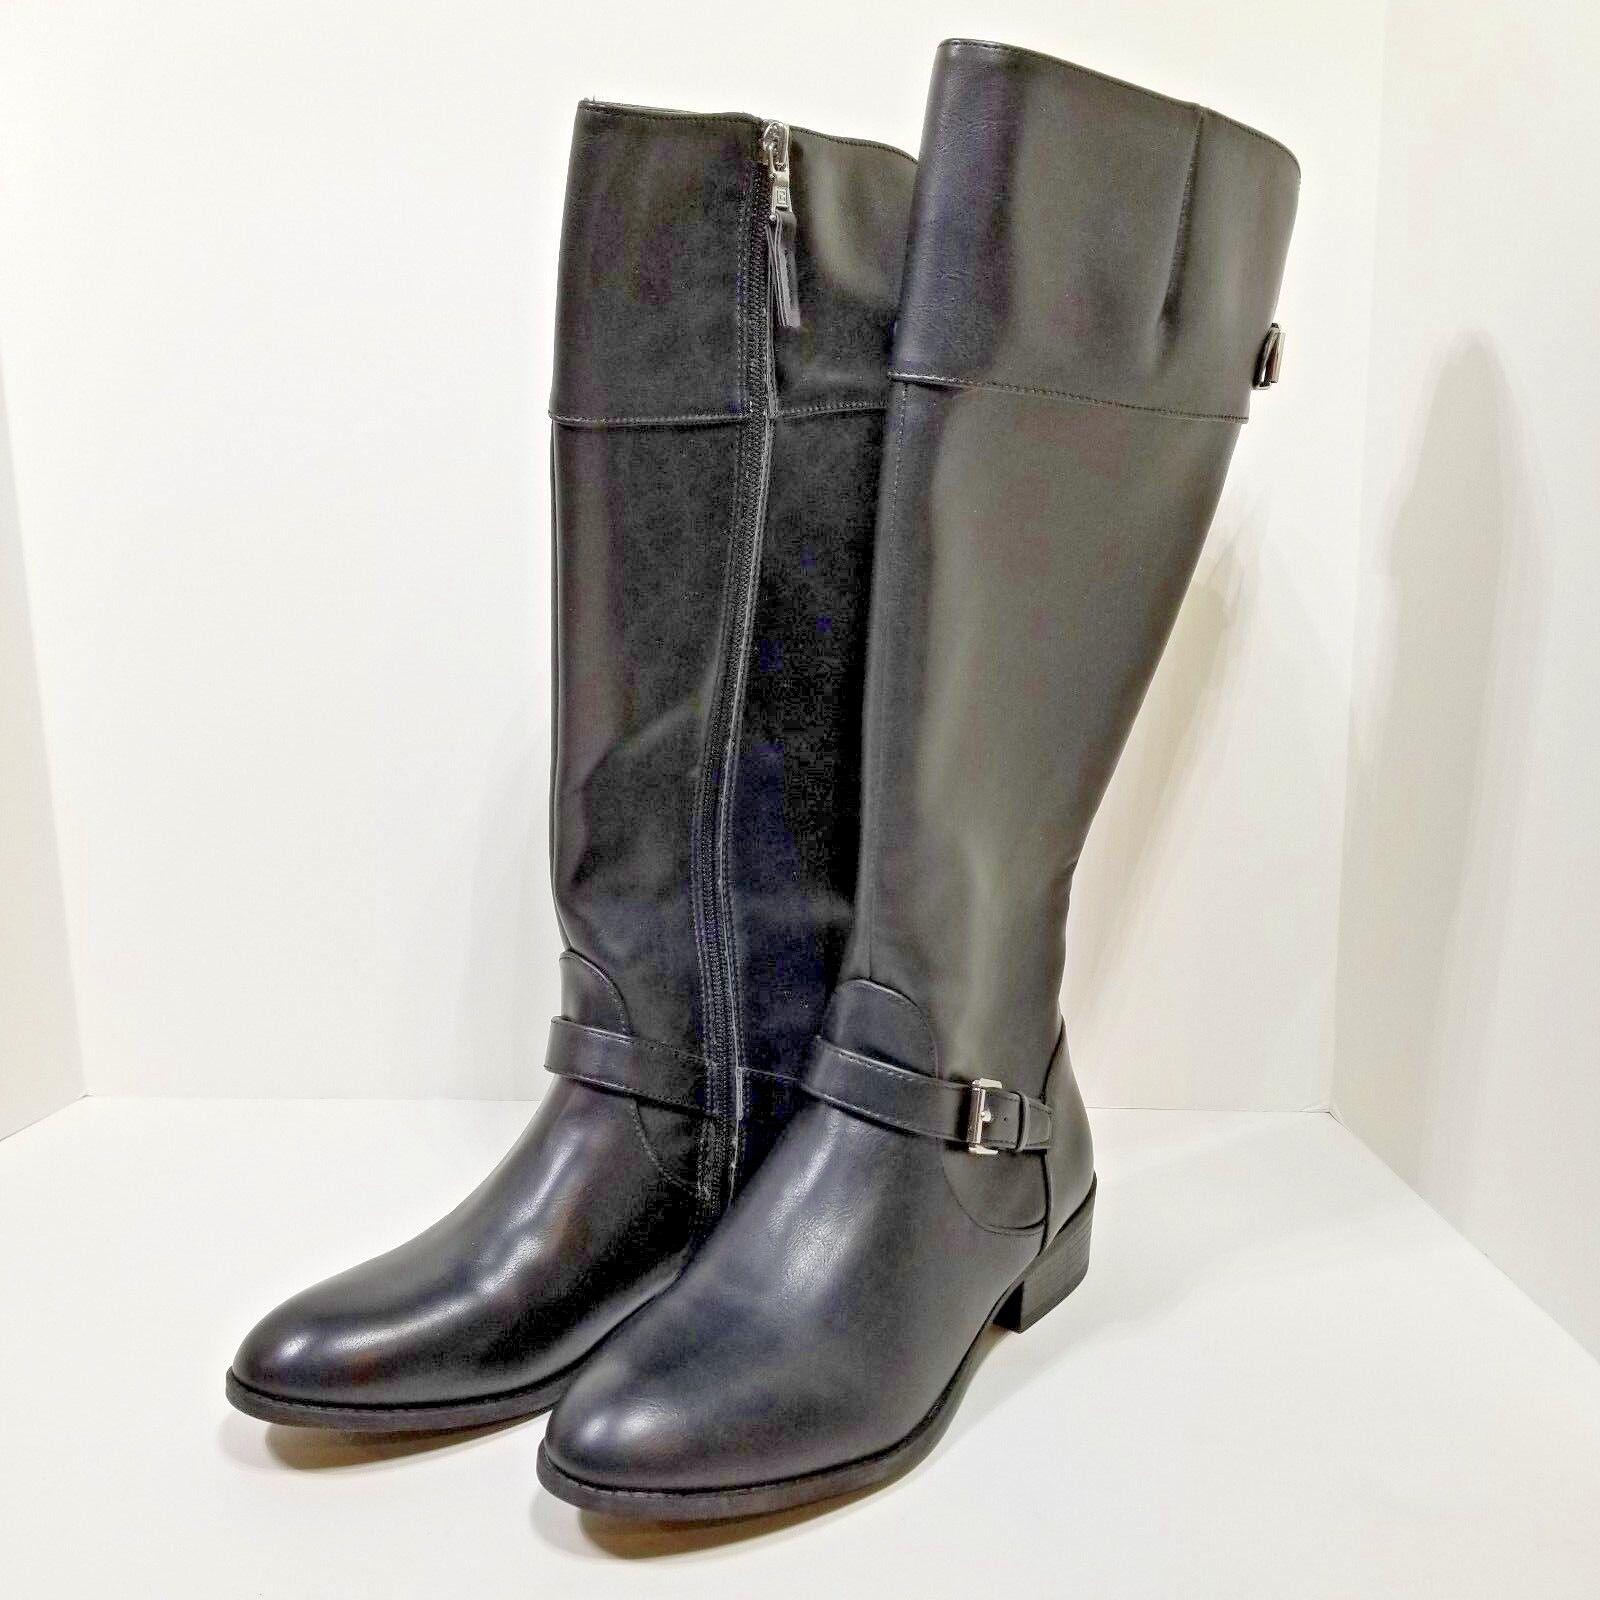 Chaps Gen Women's Black Buckle Knee High Riding Boots US 8 B NEW USA Shipping